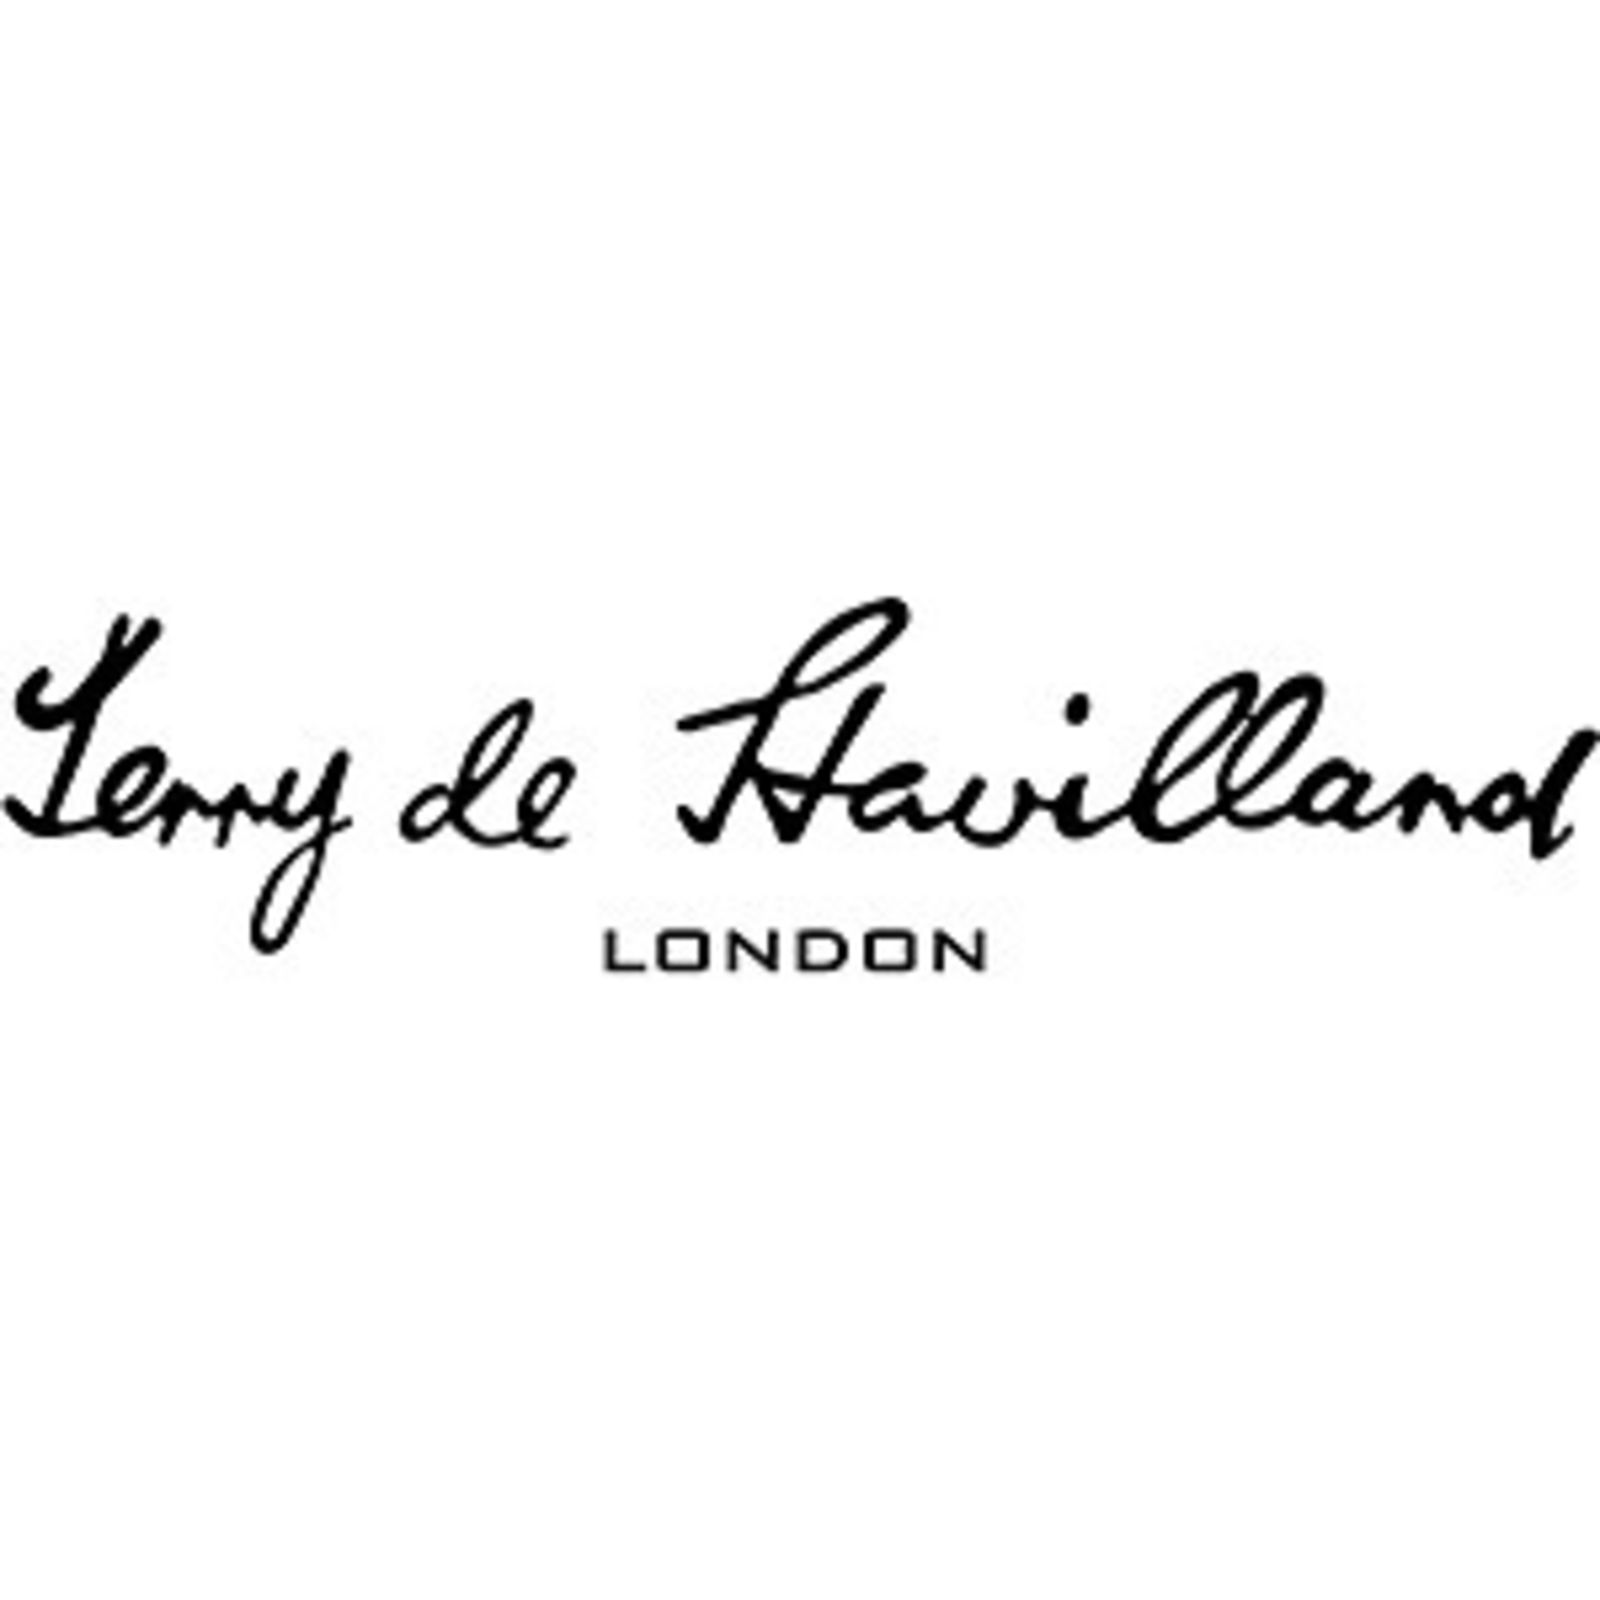 Terry de Havilland